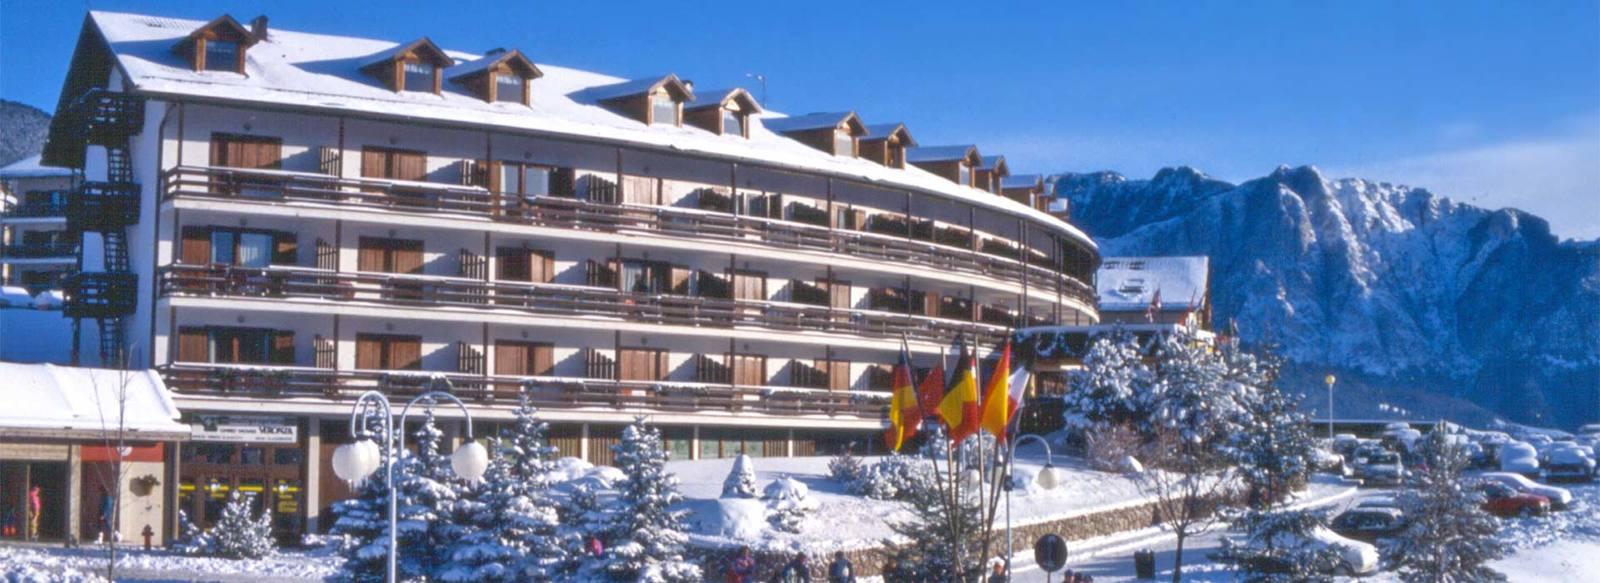 Family Resort in Val di Fiemme